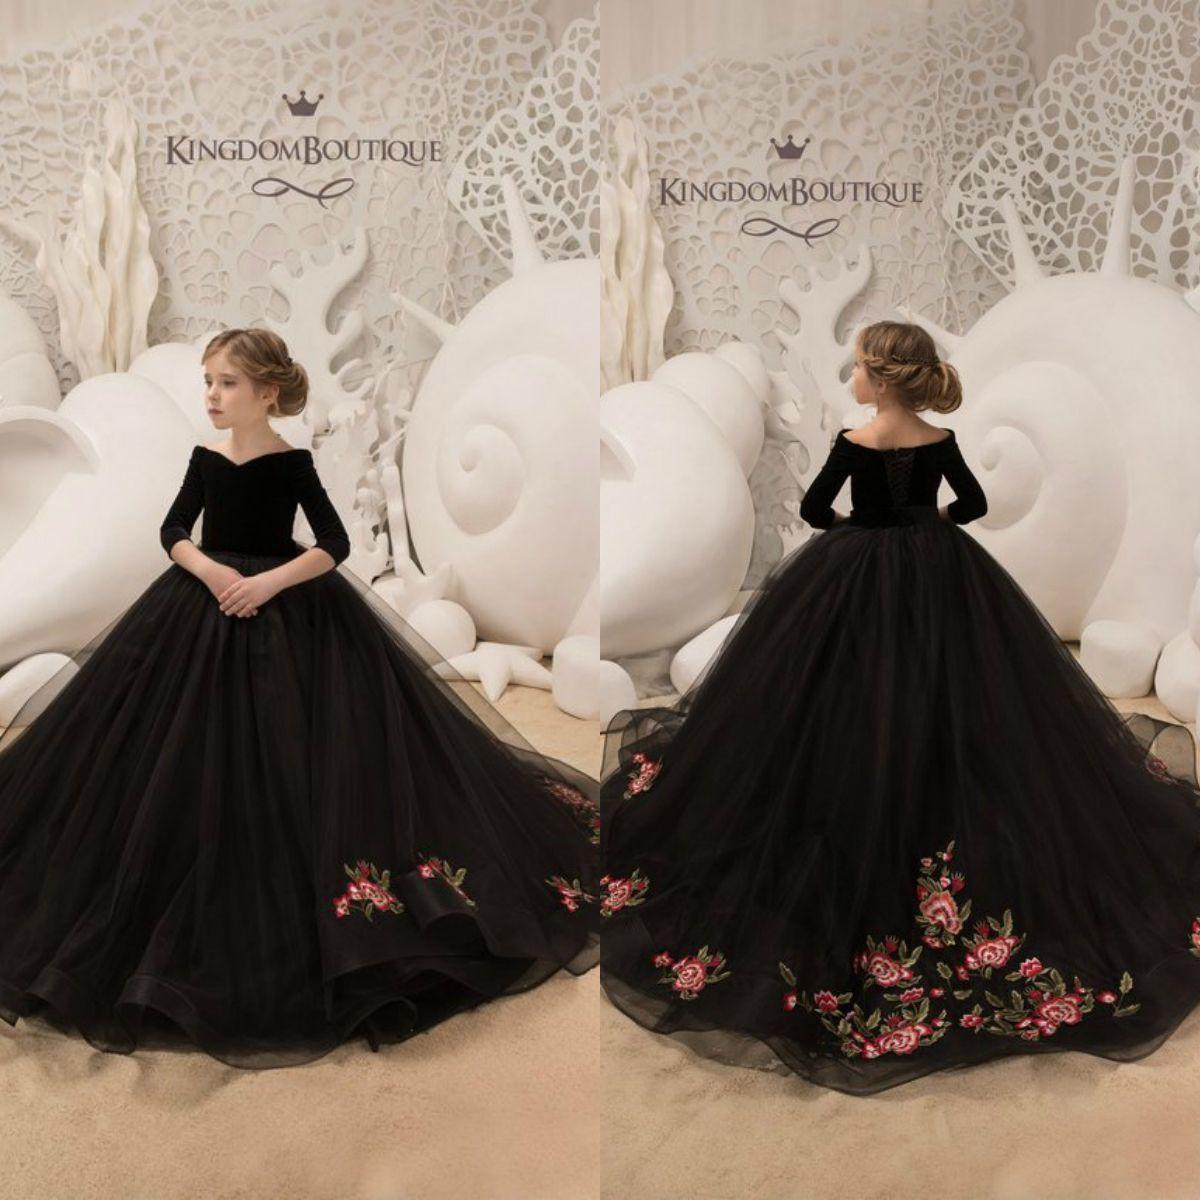 280f7d898 Compre Vestidos Bonitos De Flores Para Niñas Negras Fuera Del Hombro  Bordado 3 4 Manga Larga Princesa Vestido Para Niños Vestidos De Fiesta  Formales ...